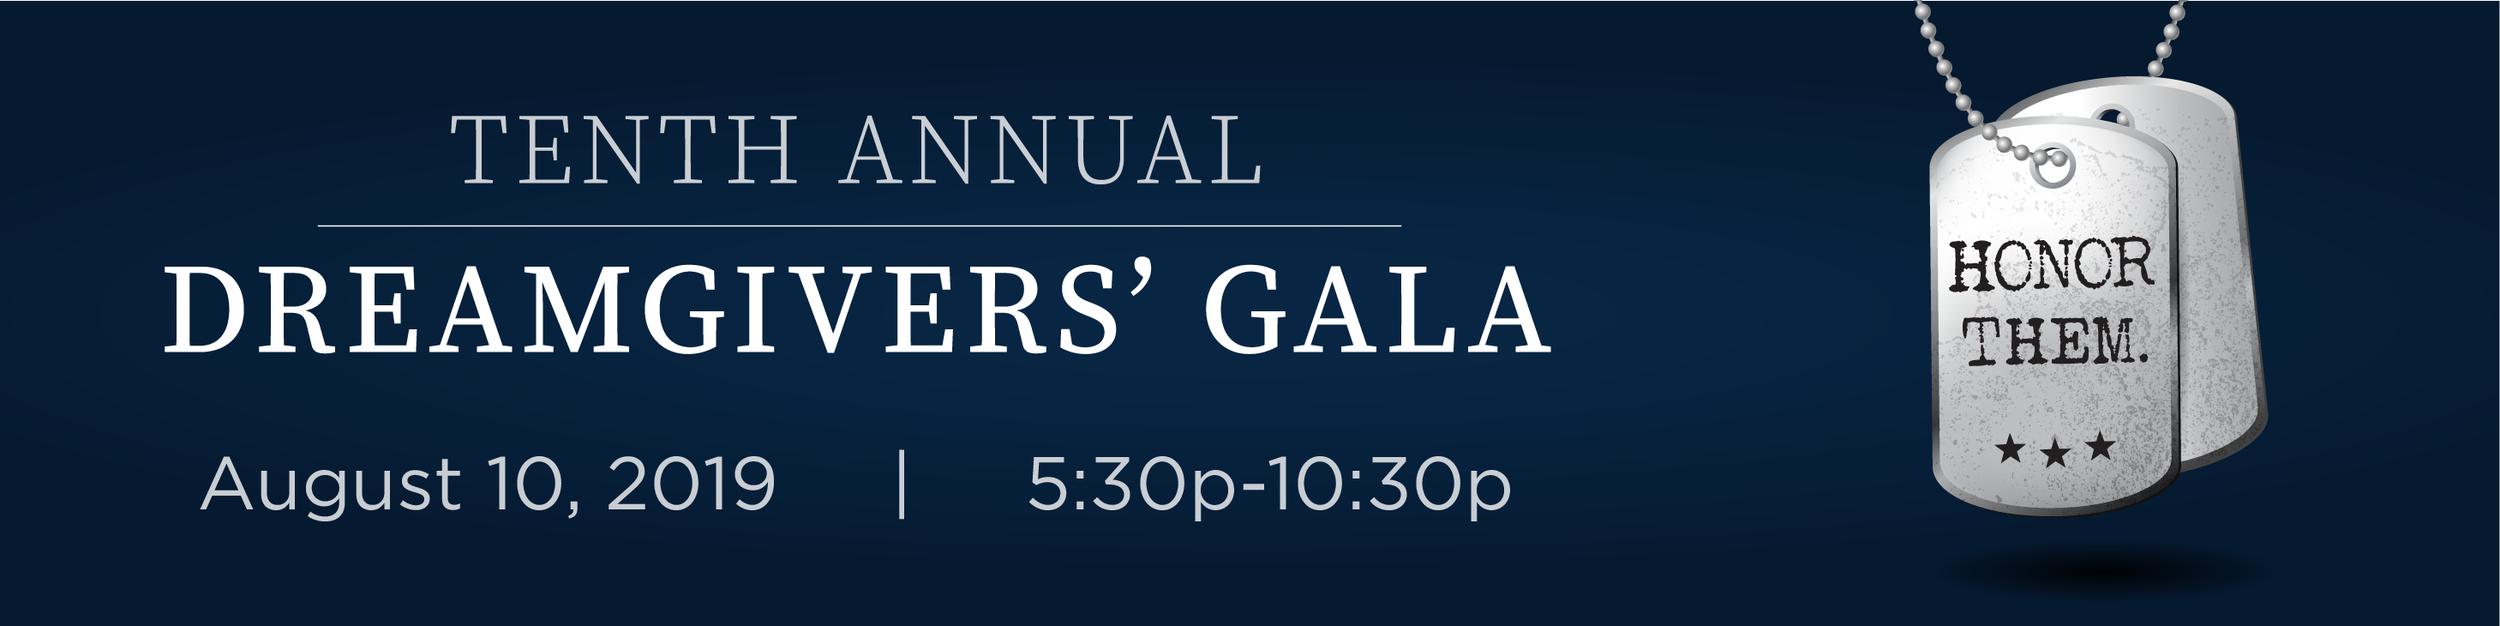 2019 Gala Banner_GiveSmart2-01.png